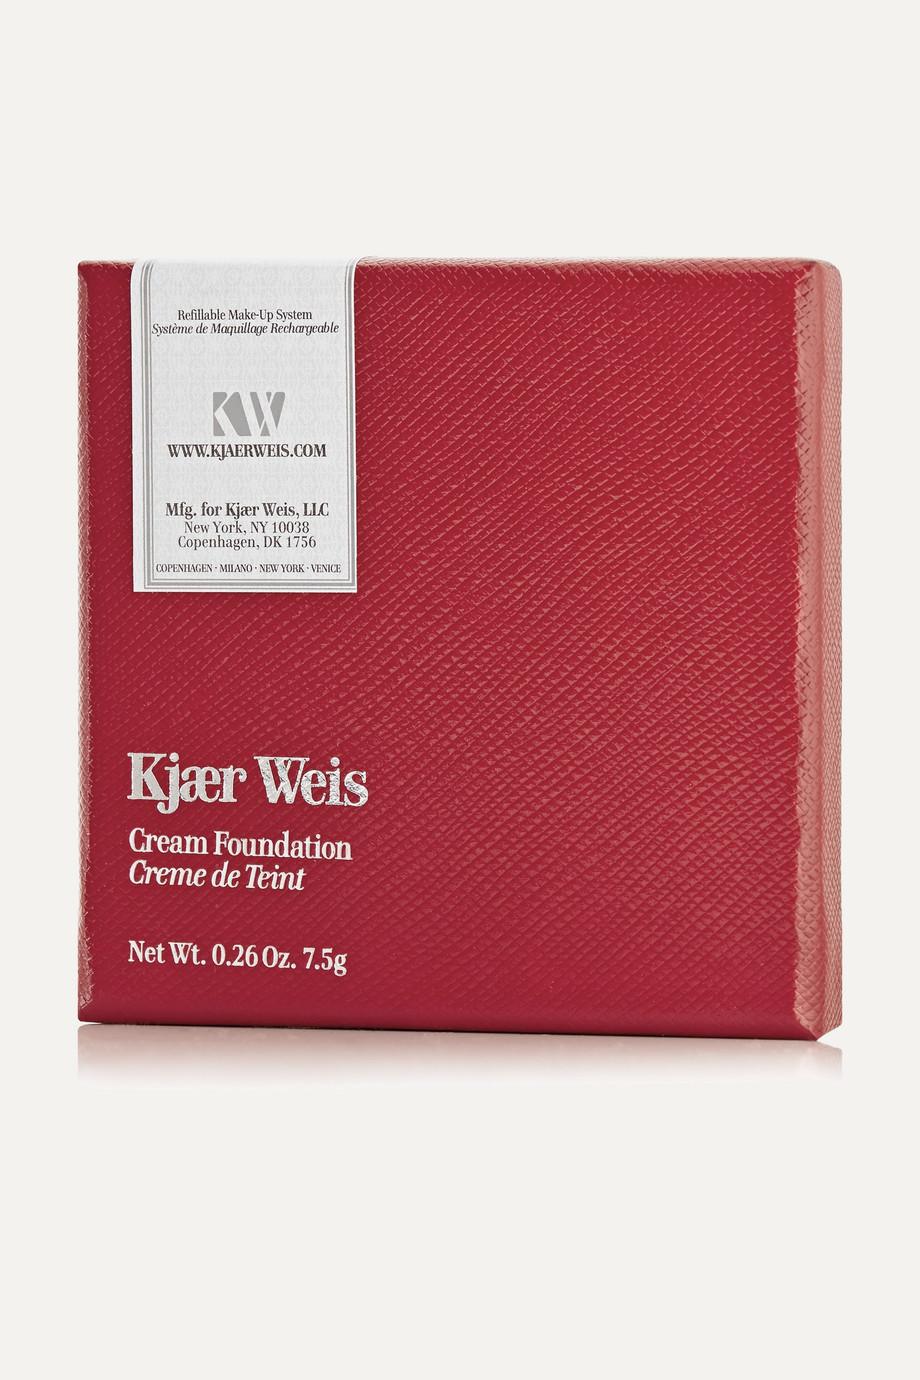 Kjaer Weis 粉底霜(色号:Subtlety)